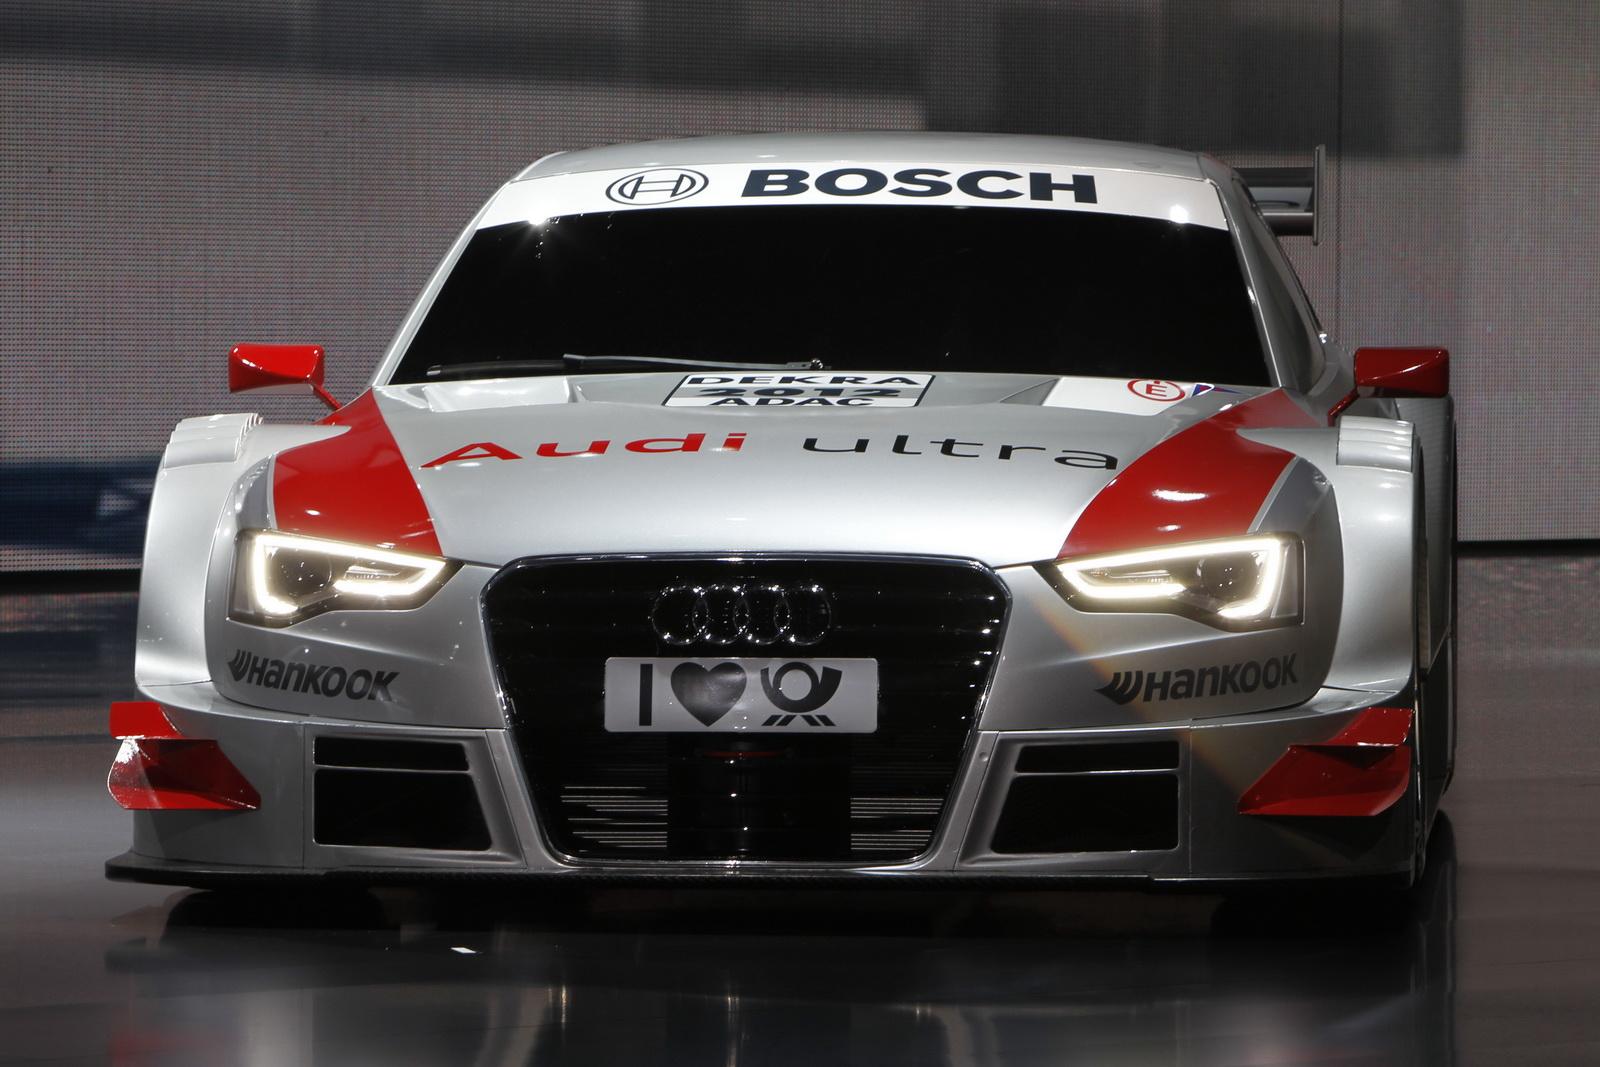 http://2.bp.blogspot.com/-0Zp8NWRnymo/TnSrZ4n_isI/AAAAAAAAfO4/oSZDIk9TnJc/s1600/A-new-Audi-car-series-DTM-2012+-2.jpg